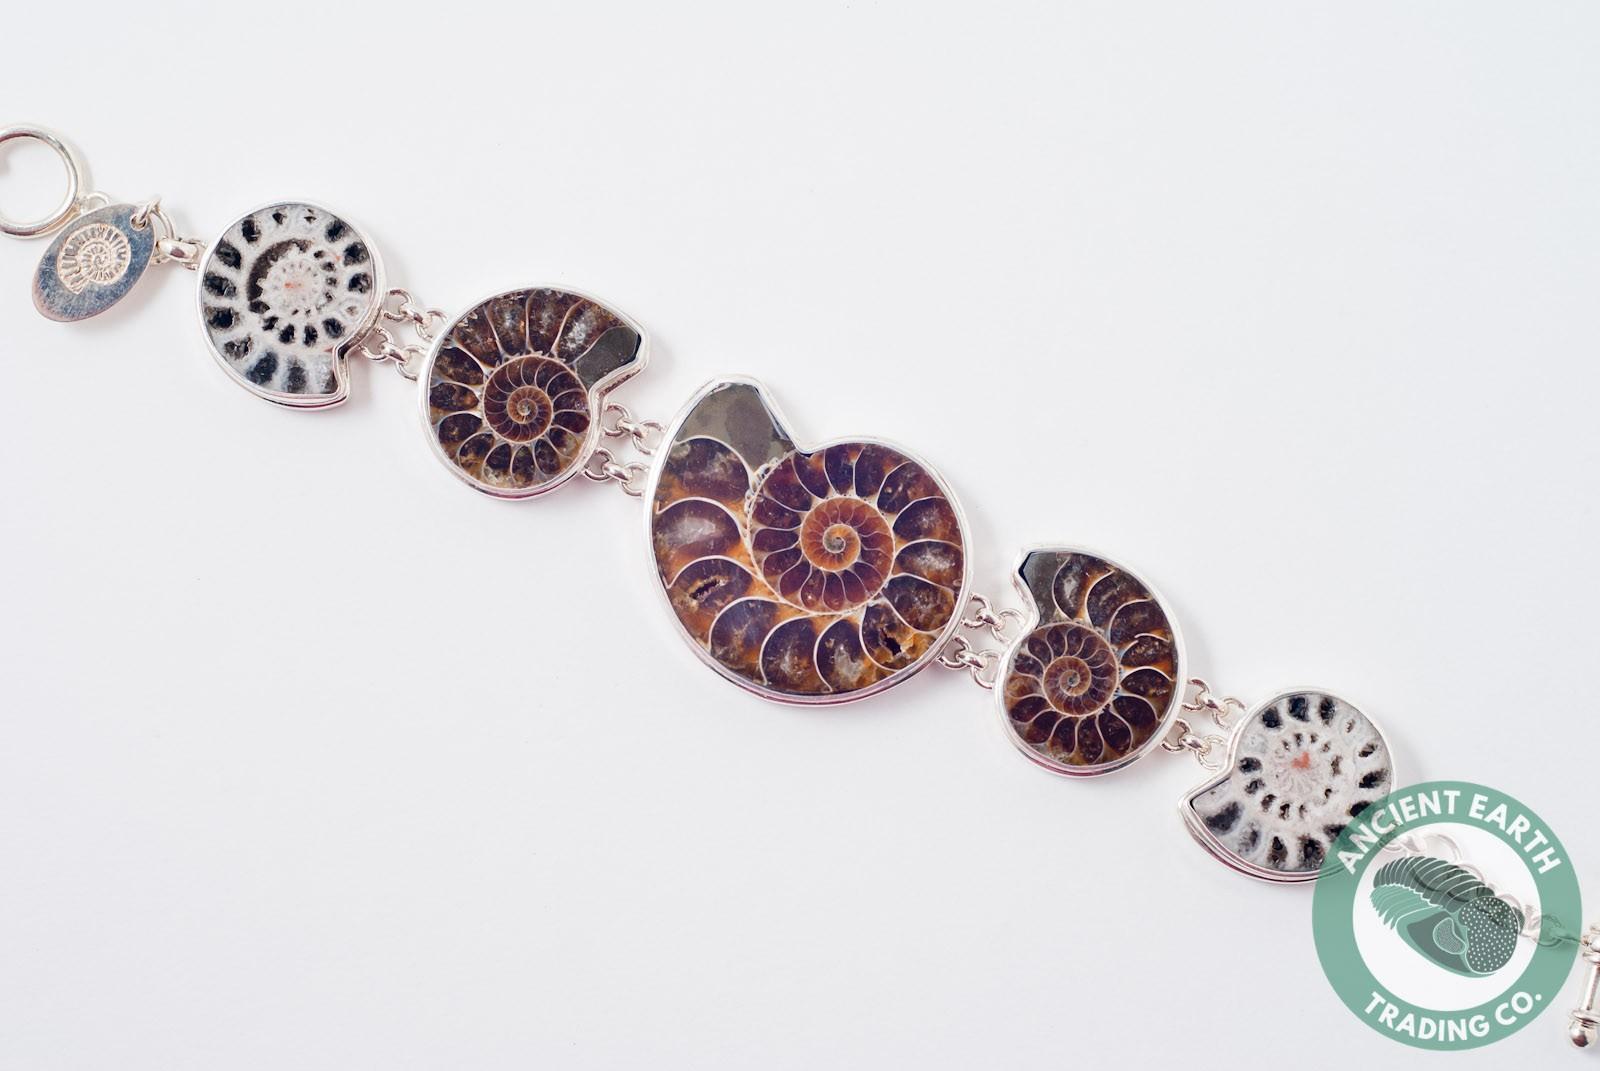 230 mm 5 Ammonite Fossil Bracelet .925 Sterling Silver